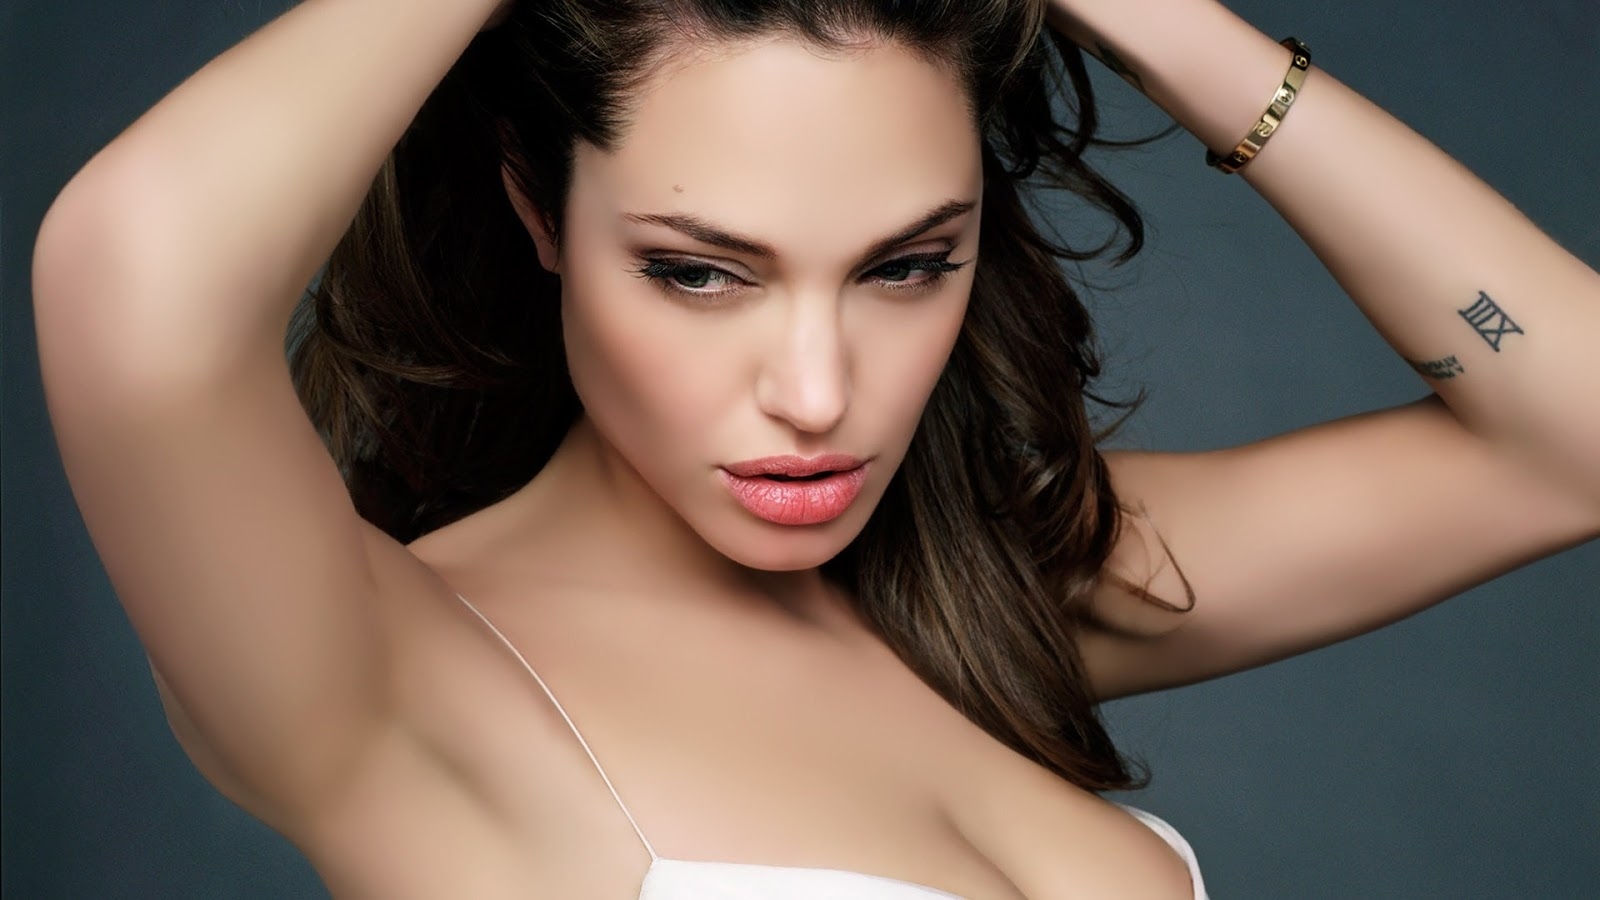 download image angelina jolie - photo #5